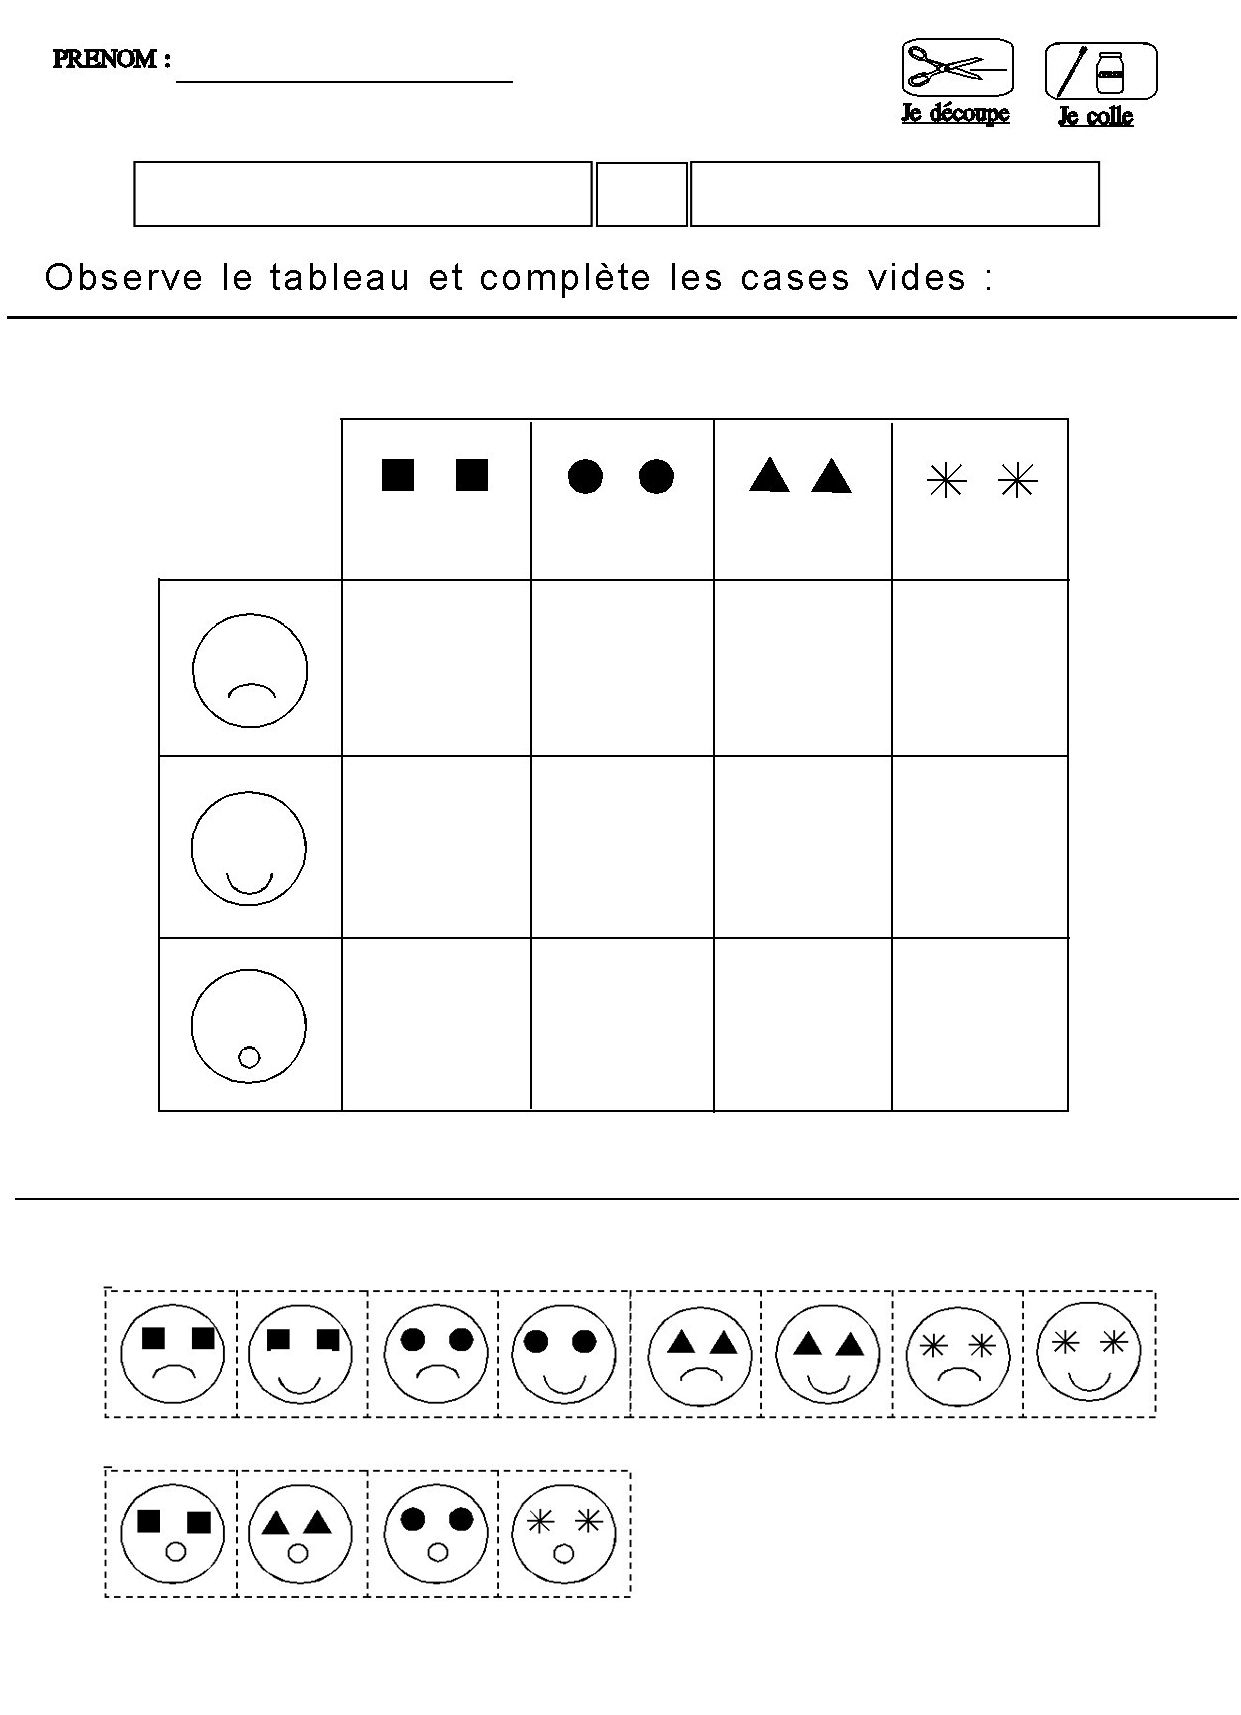 Tableau Double Entrees Pour Maternelle Moyenne Section pour Moyen Section Maternelle Exercice